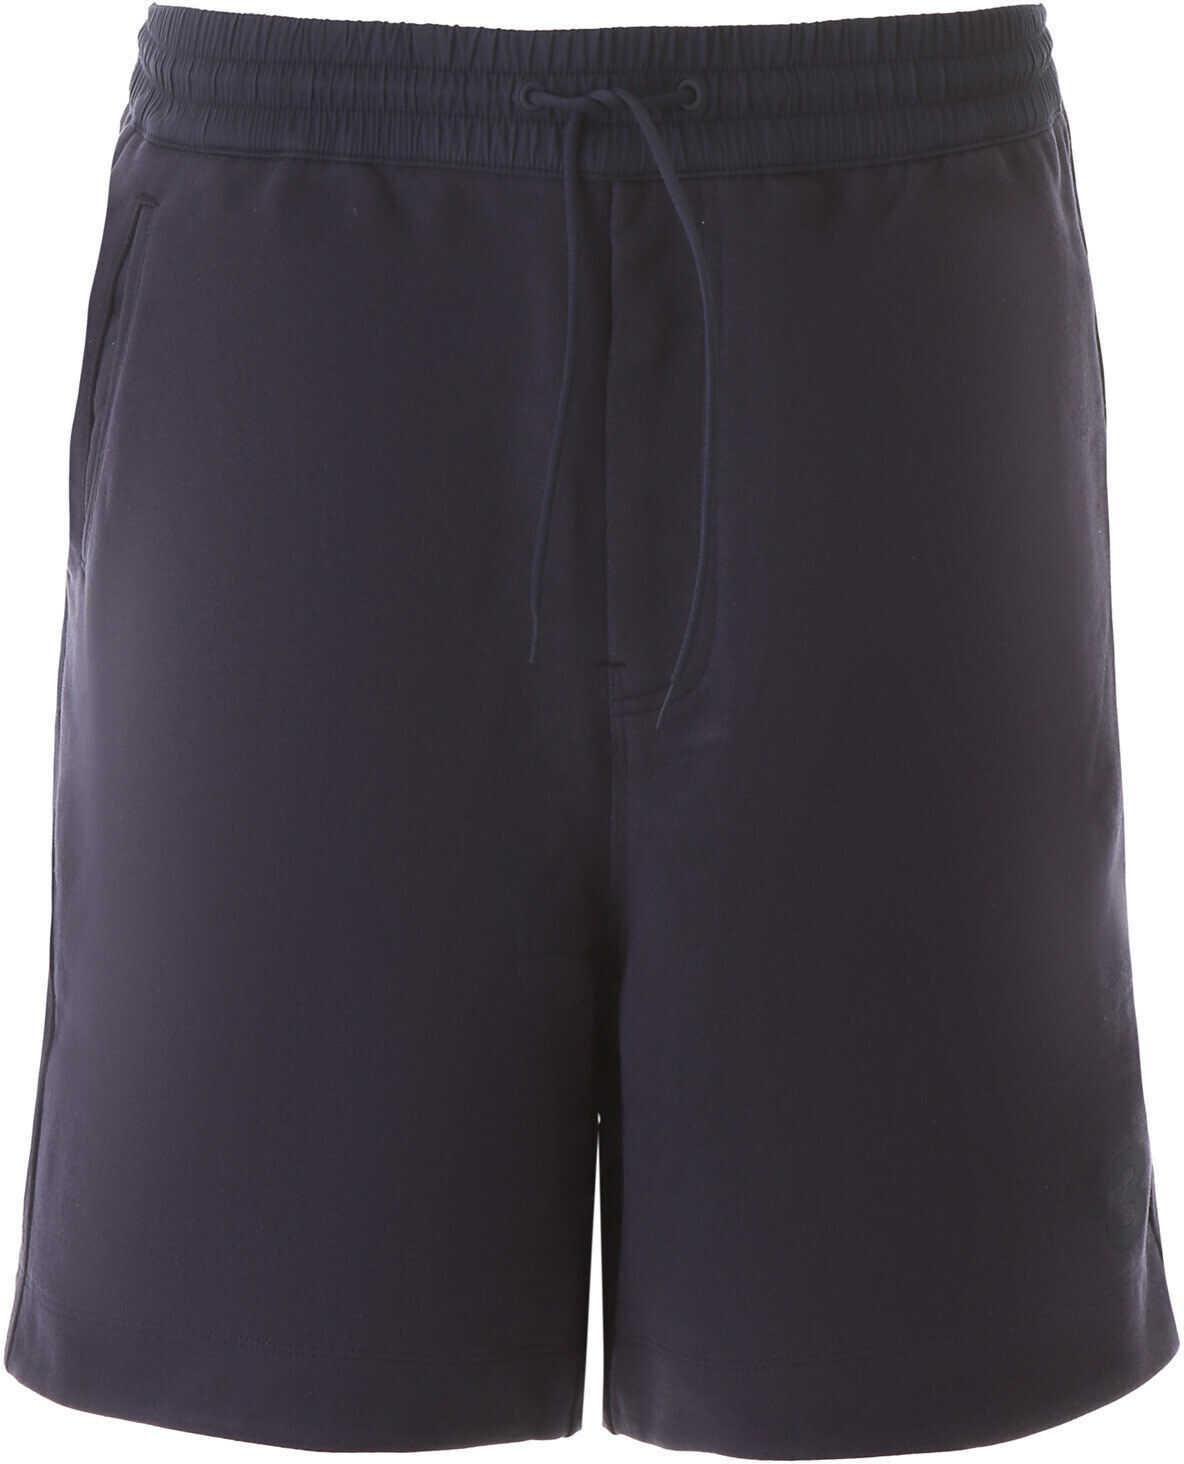 Y-3 Short Jogger Pants With Logo* LEGEND INK